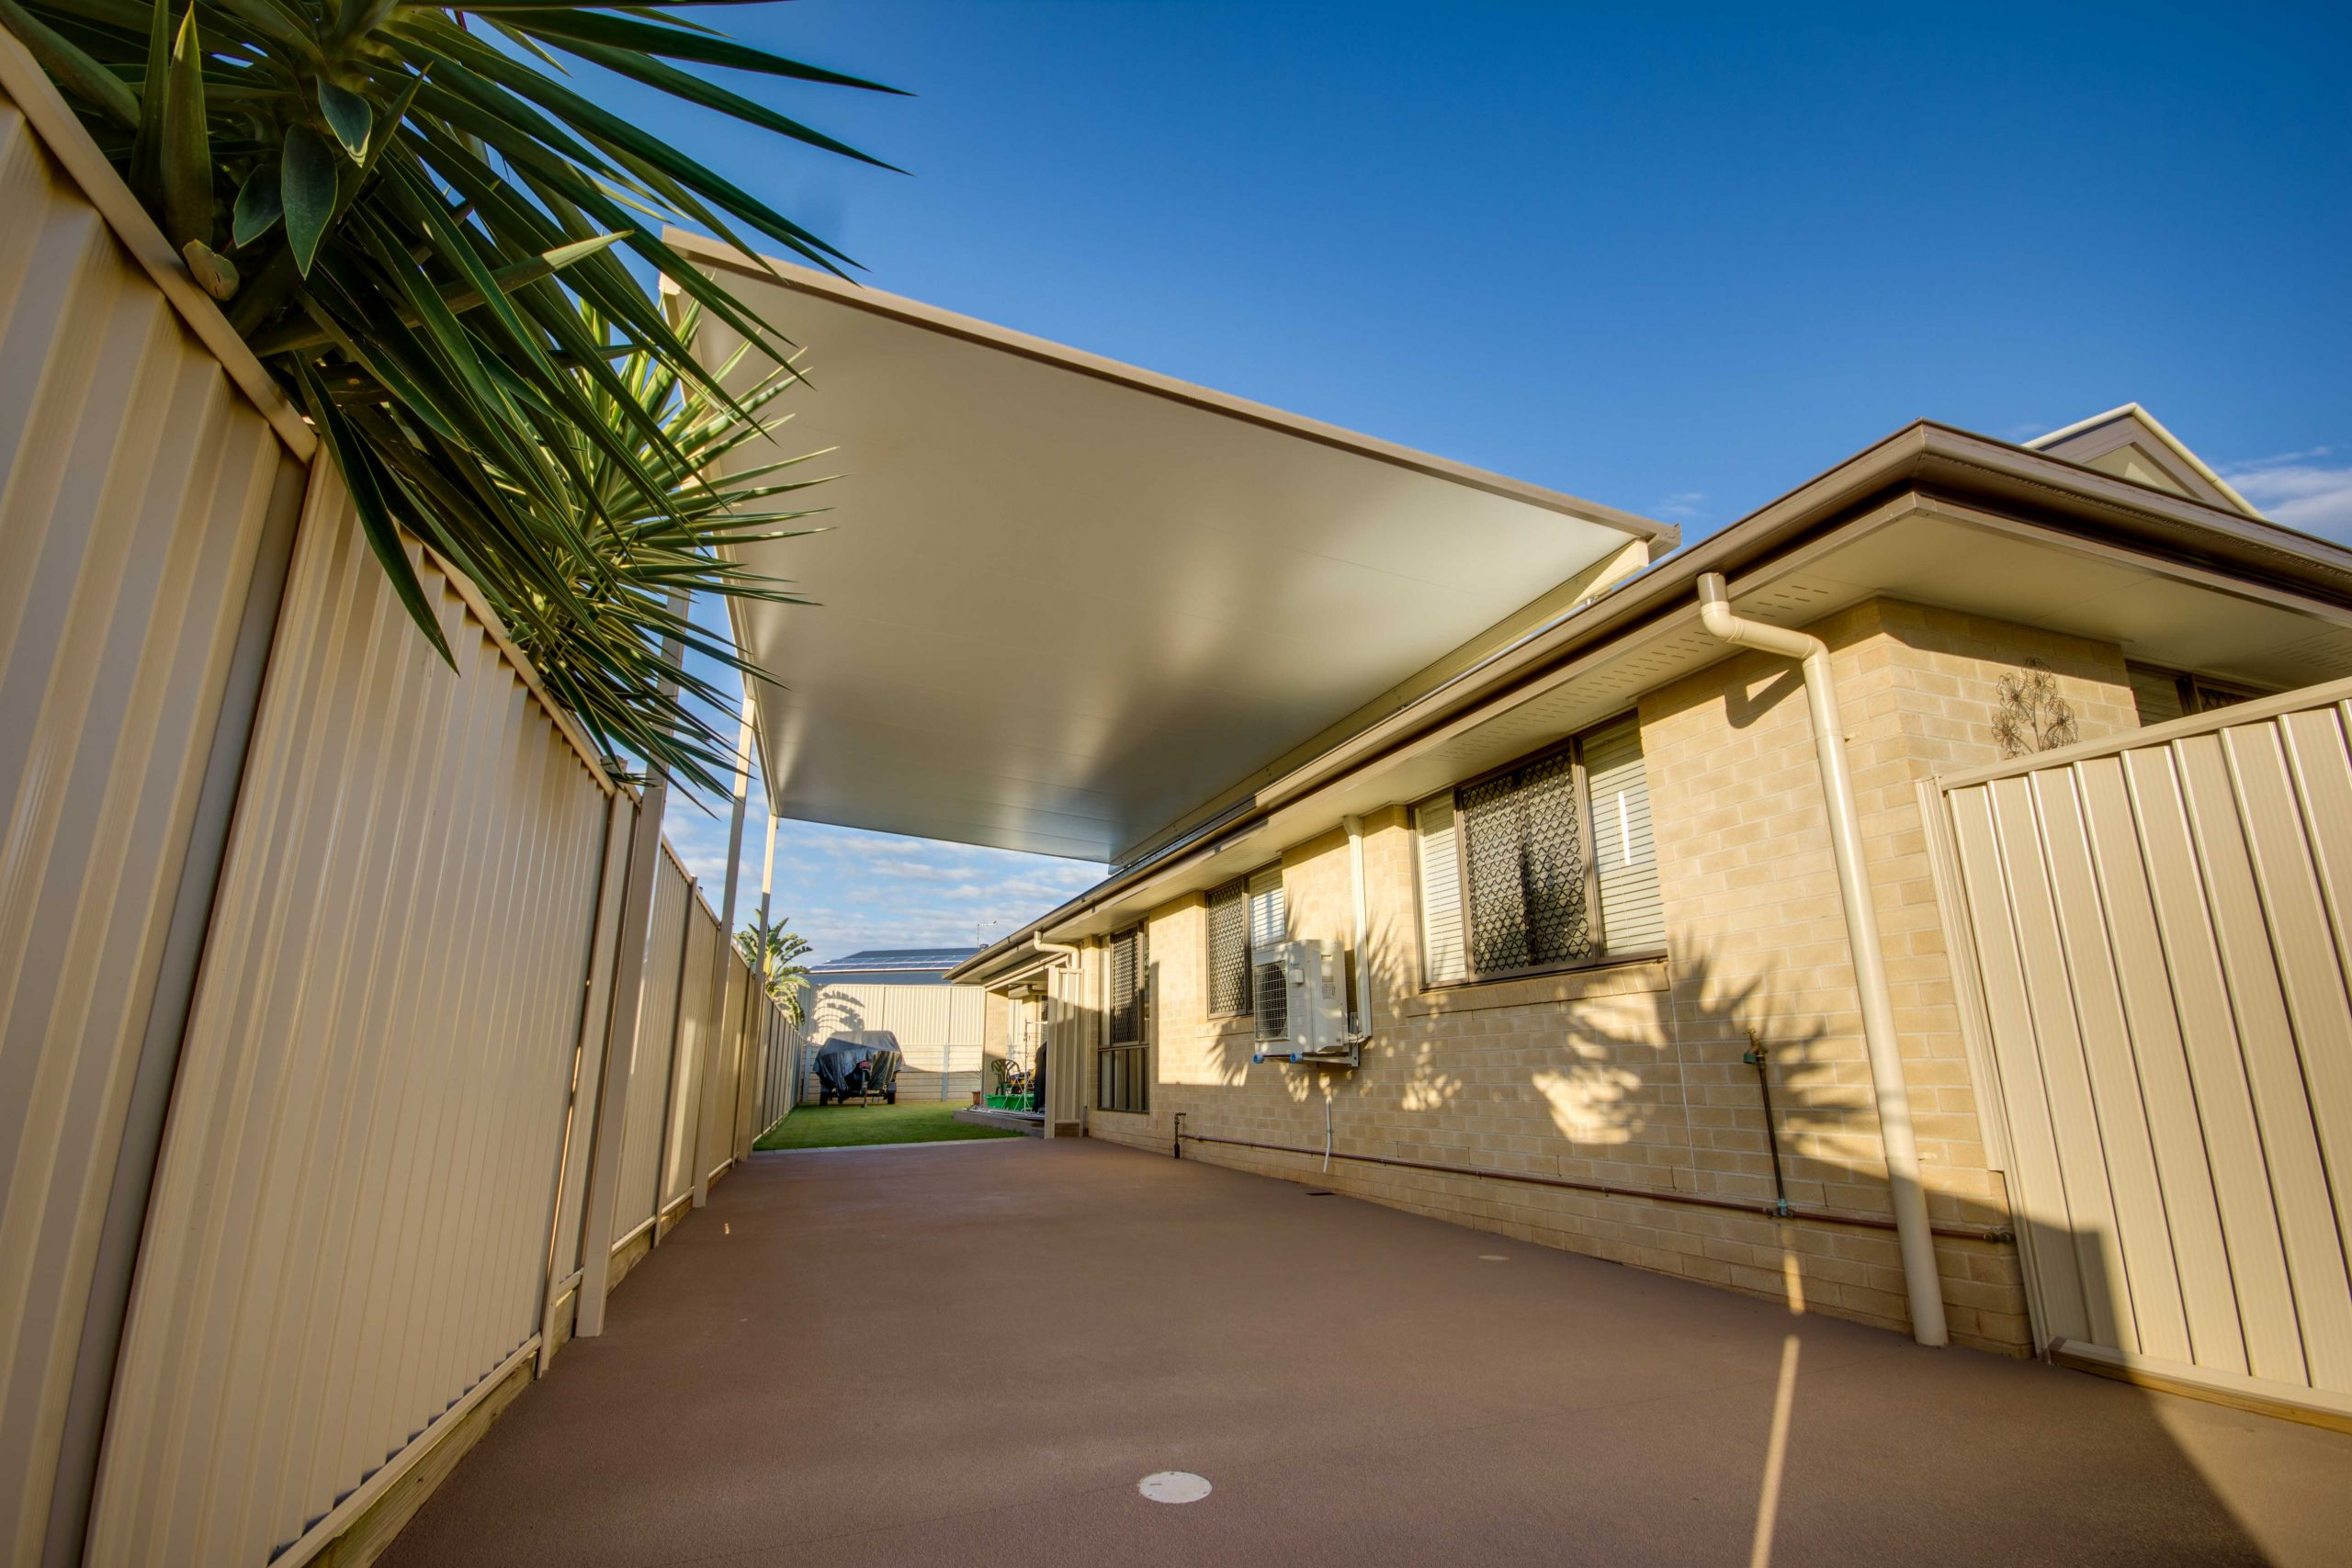 building a carport on side of house brisbane Brisbane, Gold Coast & Sunshine Coast